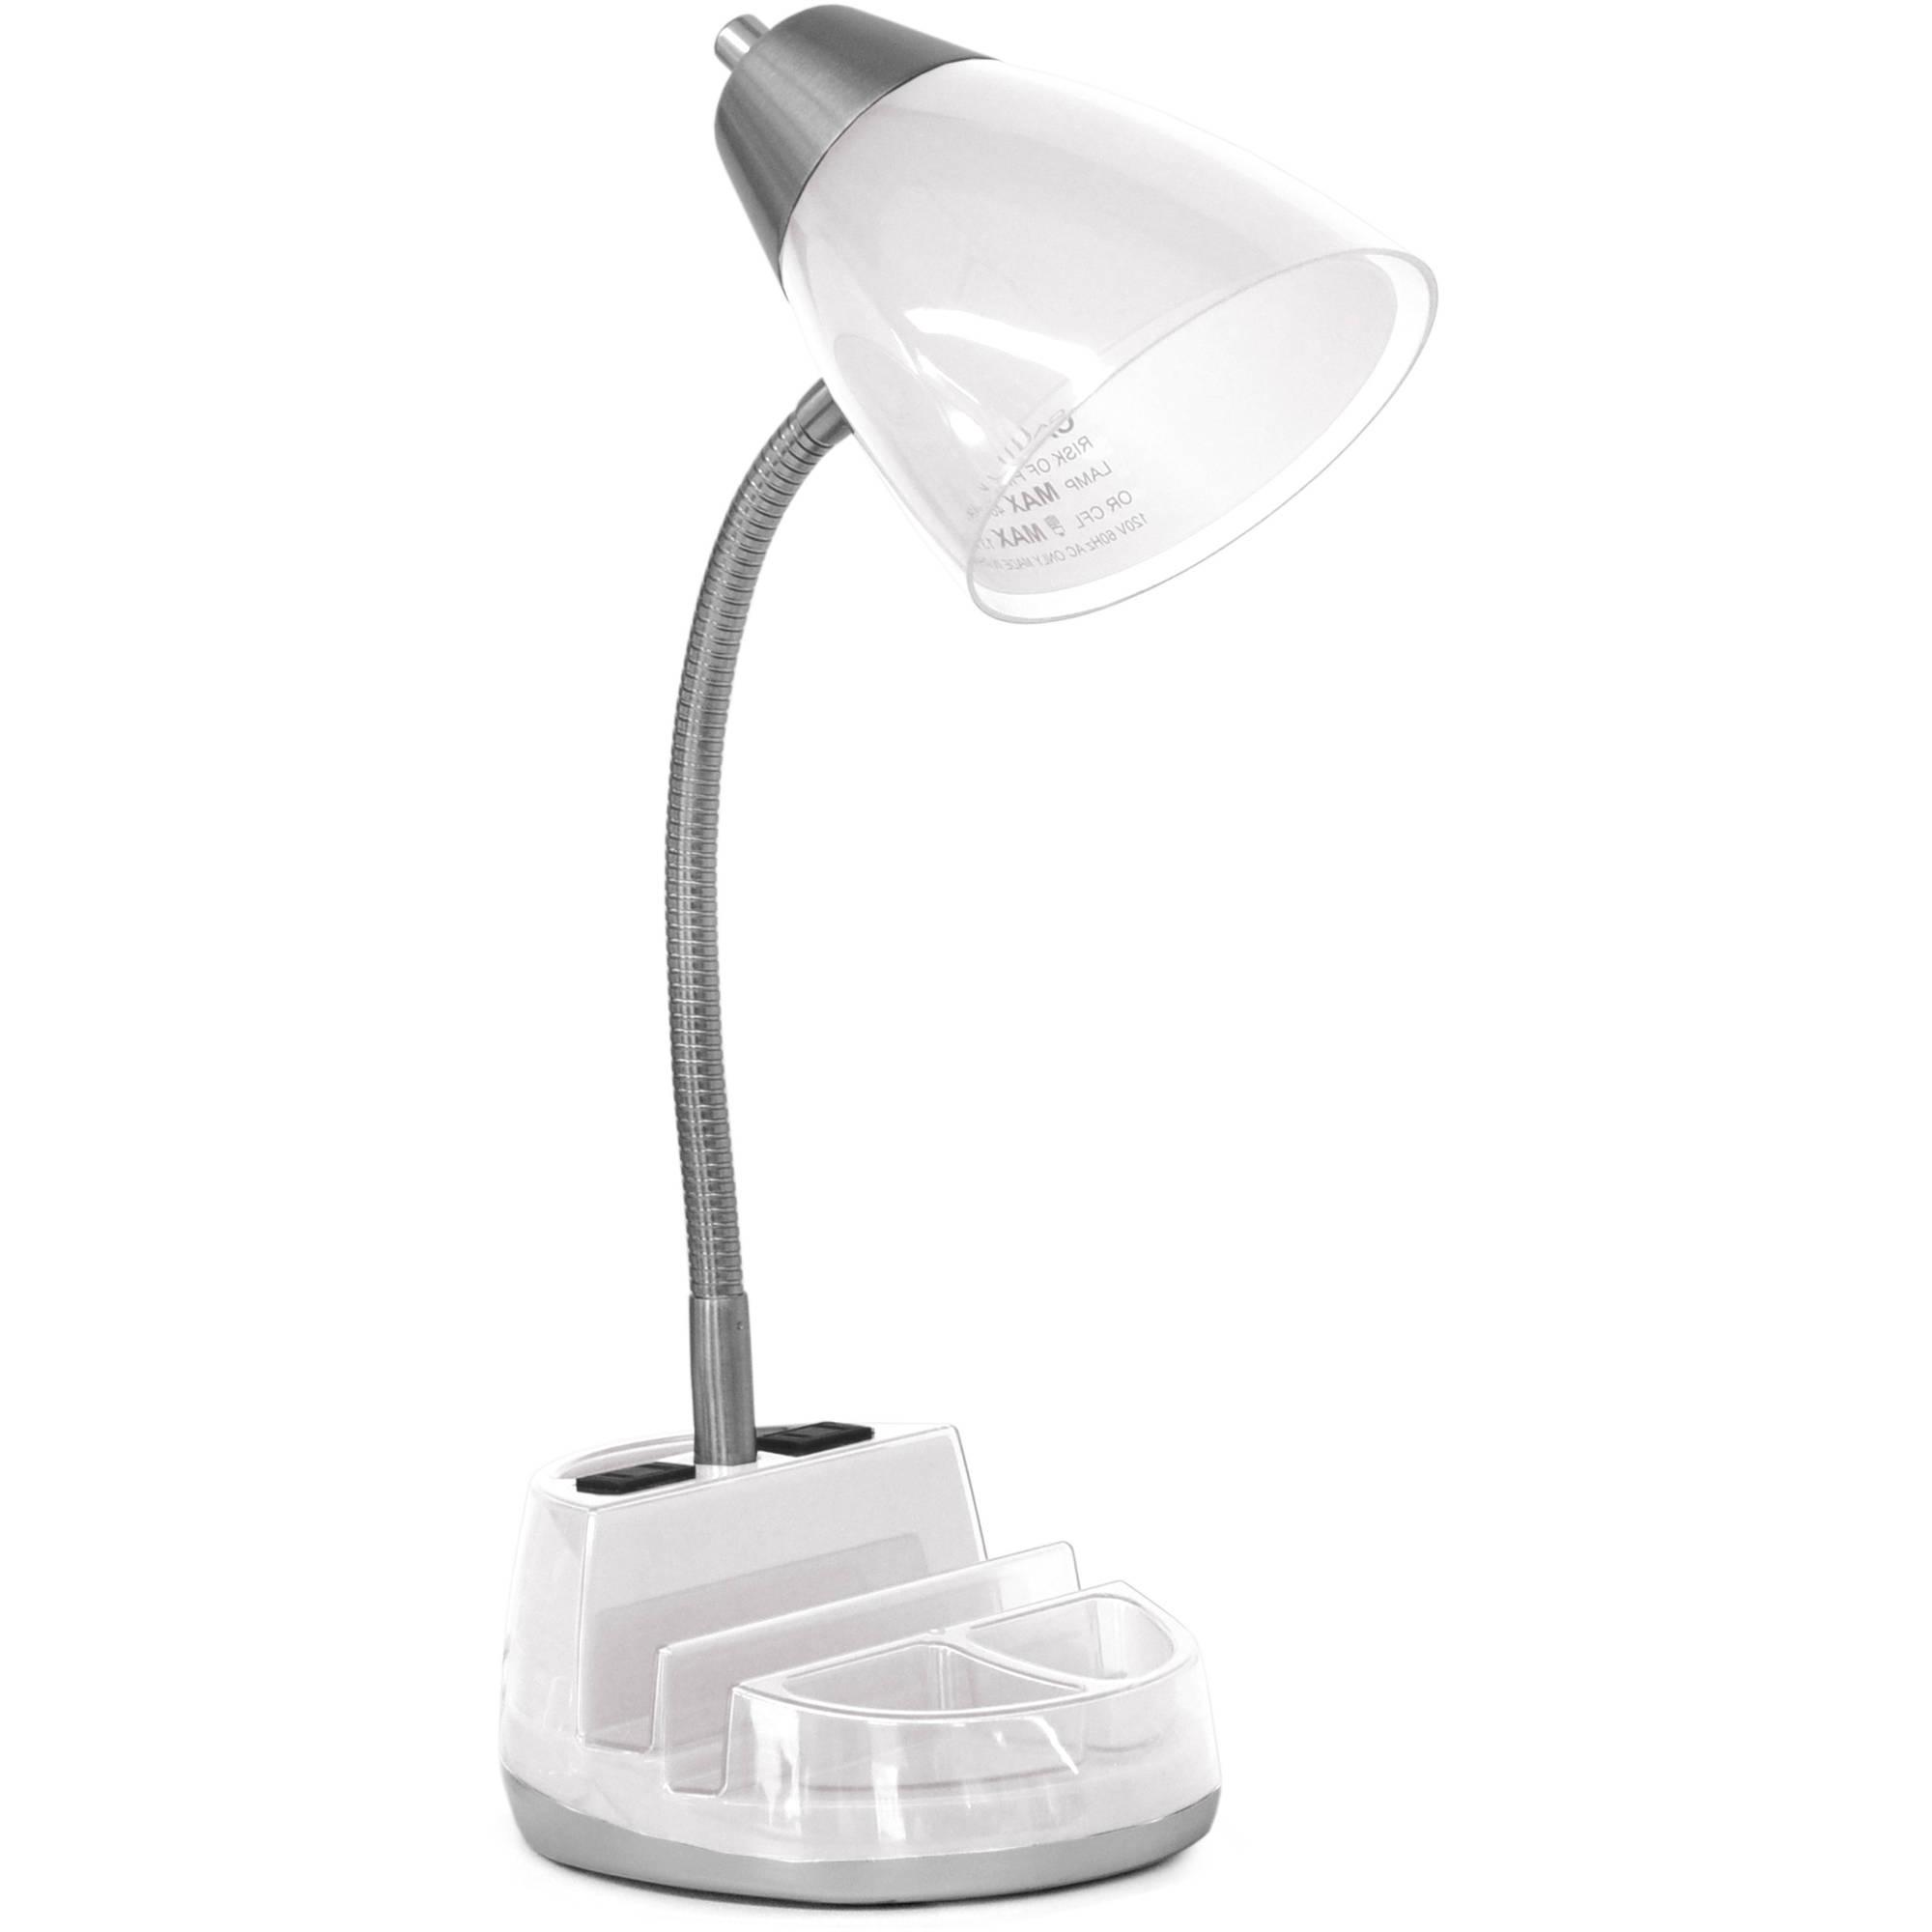 Desk Lamp Y7du Mainstays Tablet organizer Desk Lamp with Cfl Bulb Walmart